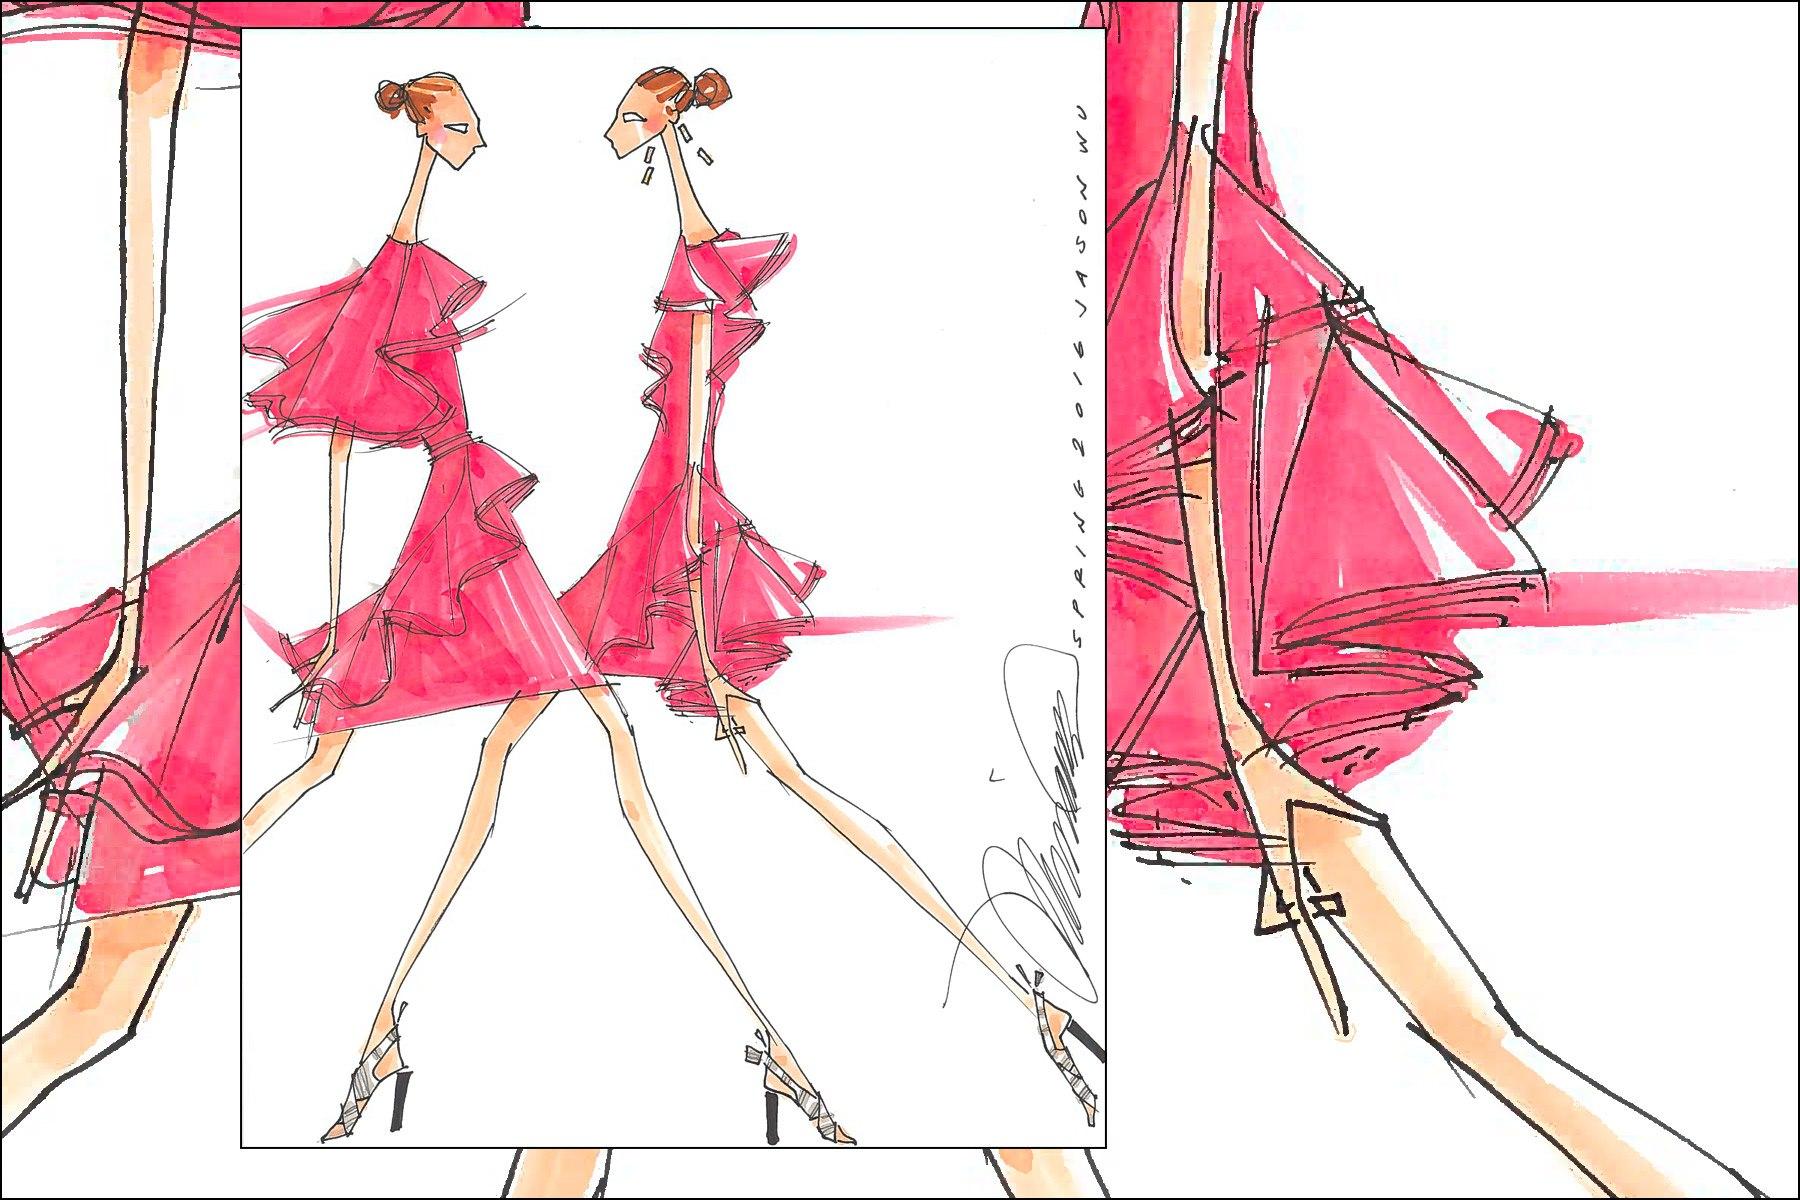 Jason Wu Spring 2016 fashion illustration by Michael Ward. Ponyboy magazine New York.